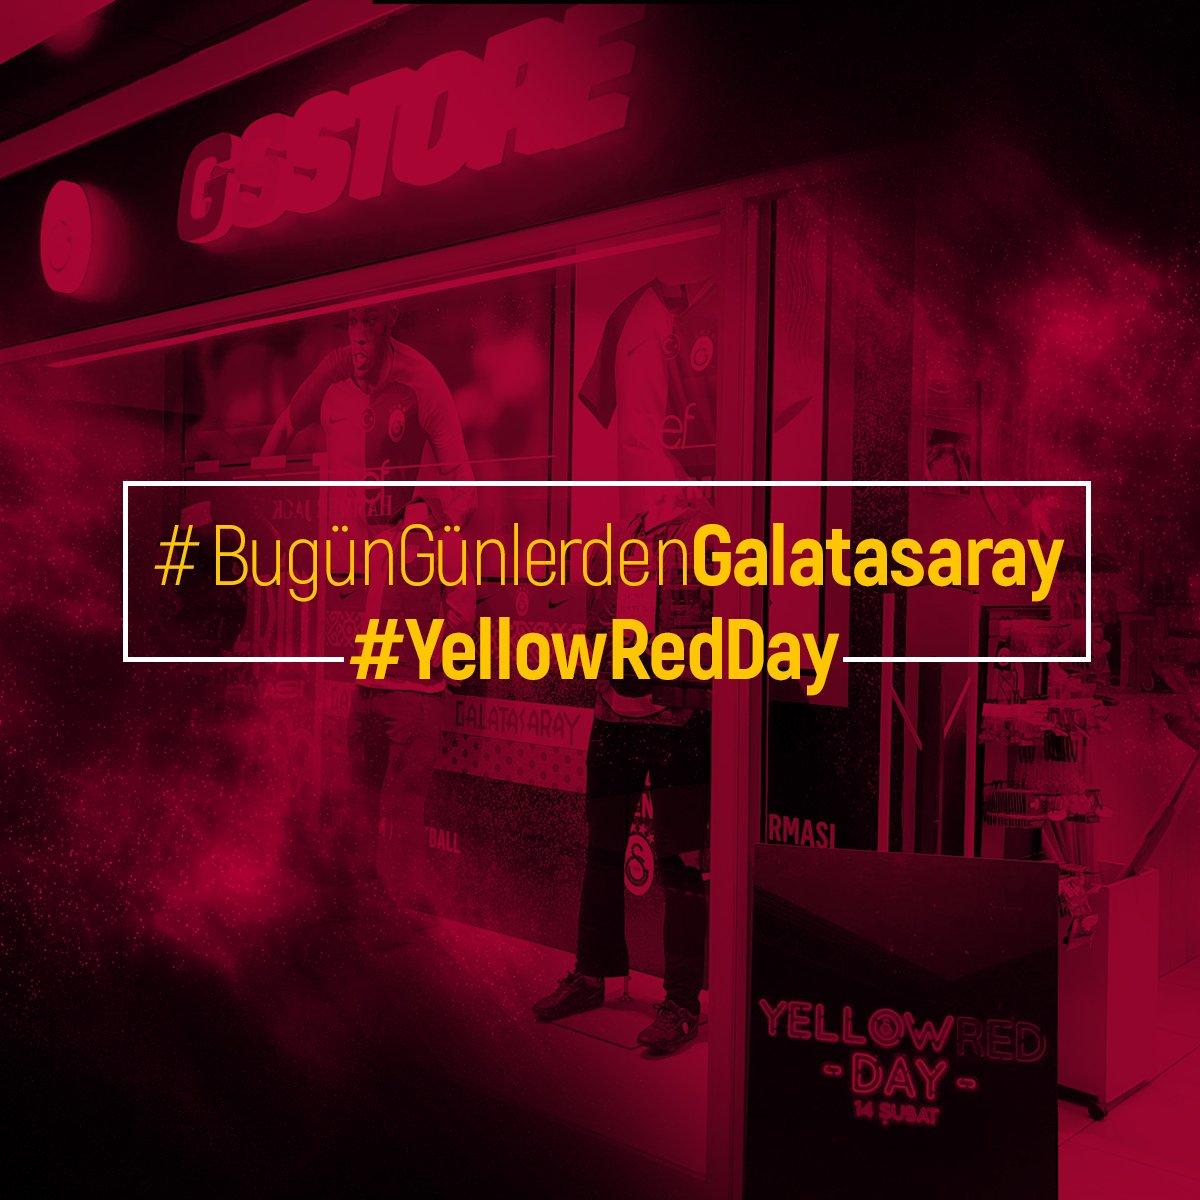 #BugünGünlerdenGALATASARAY #YellowRedDay